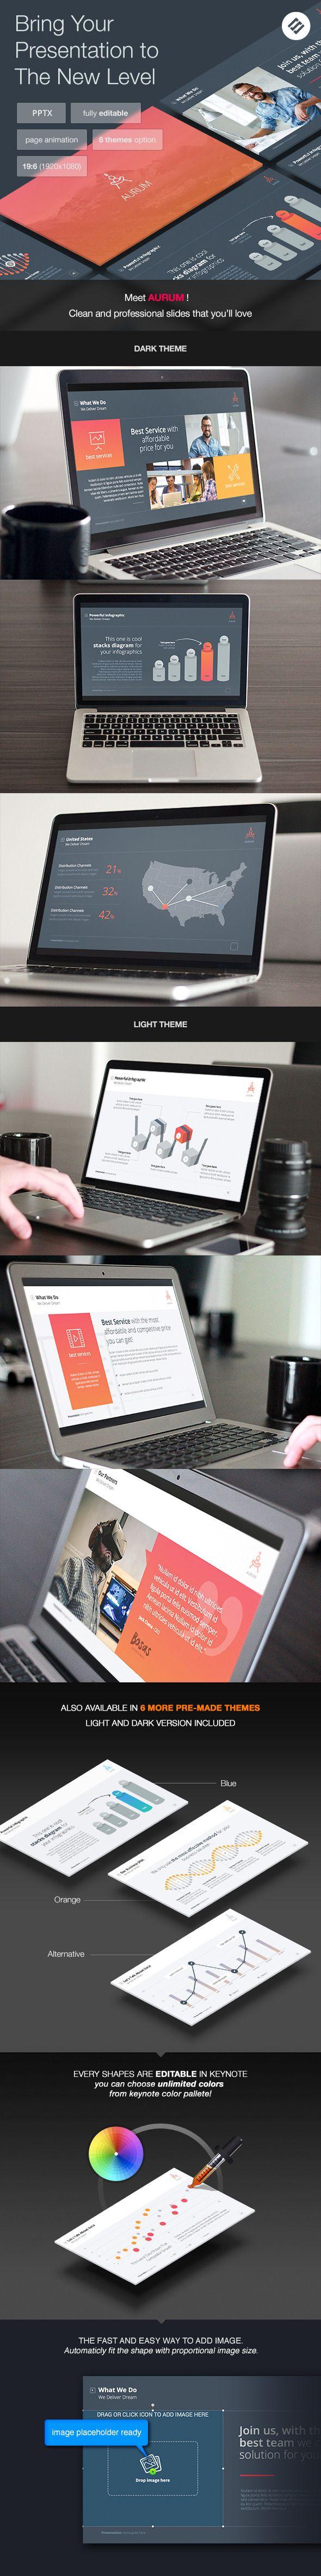 Aurum - Agency Powerpoint Template - PowerPoint Templates Presentation Templates